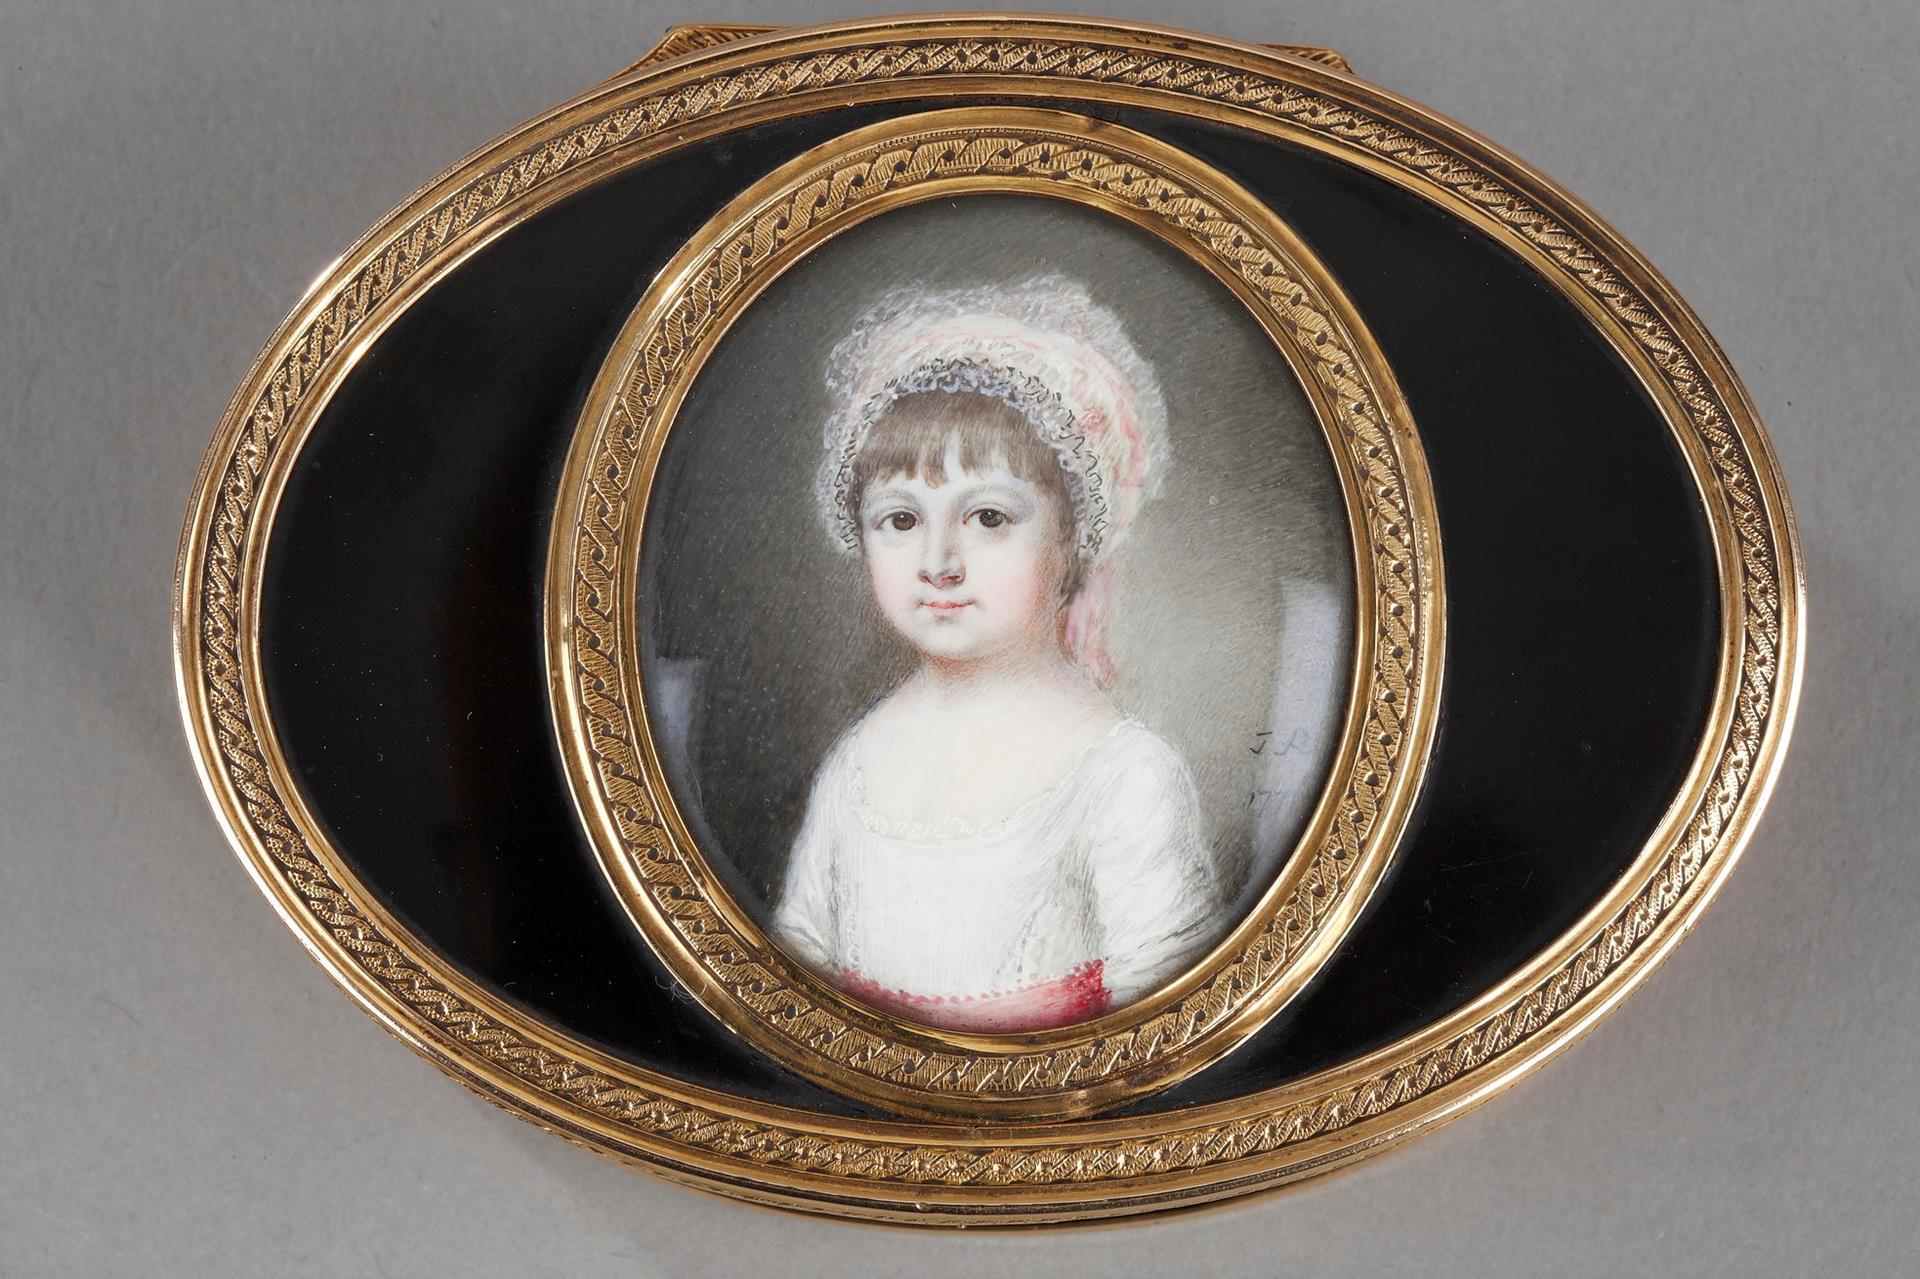 A Louis XV gold-mounted tortoiseshell portrait snuff box. Circa 1771-1774.